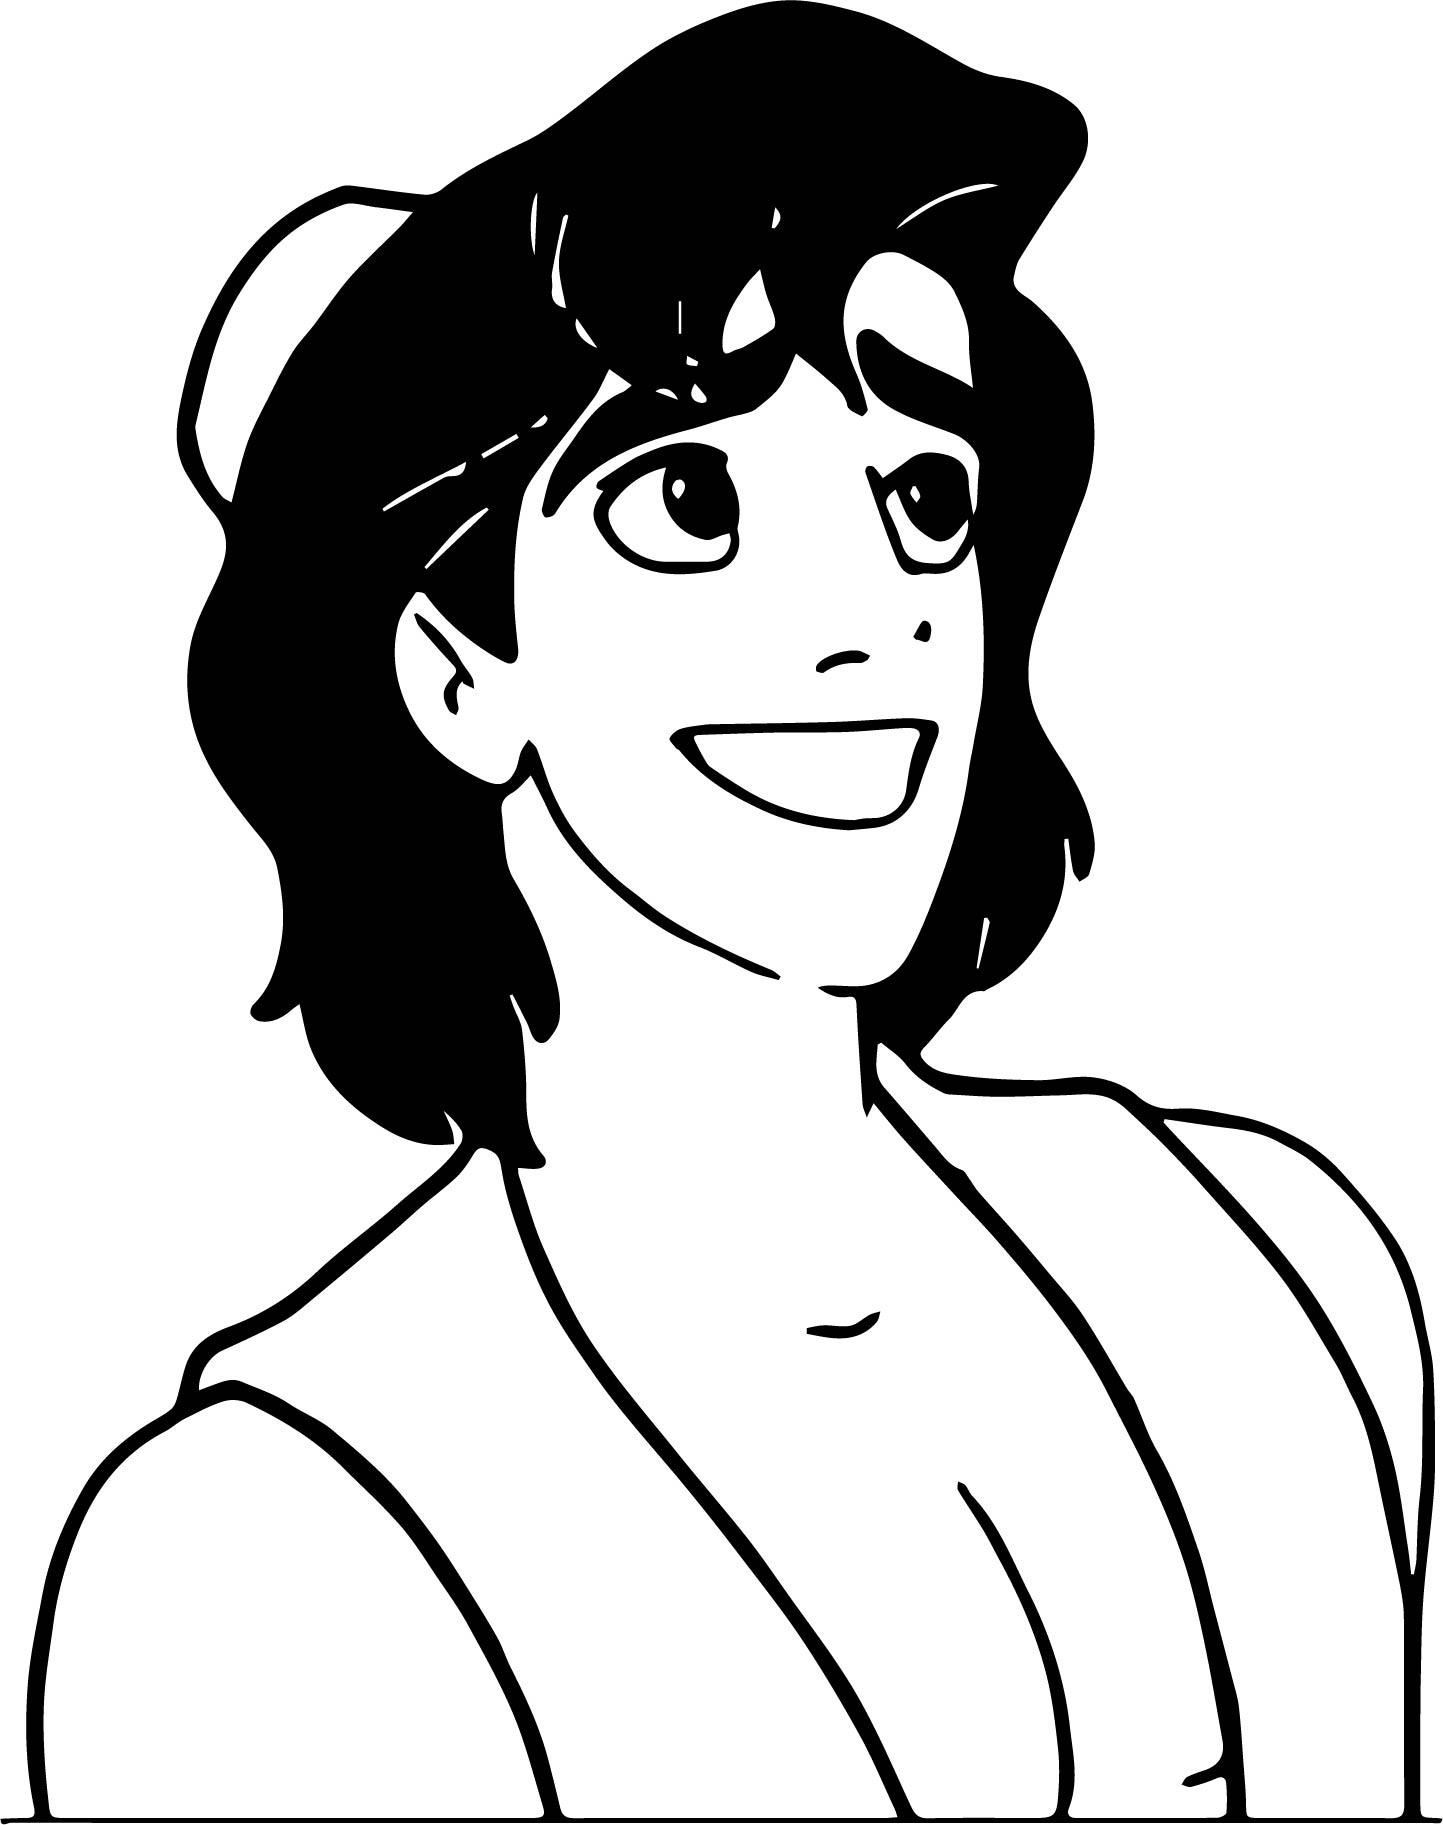 walt disney prince aladdin walt disney characters happy coloring